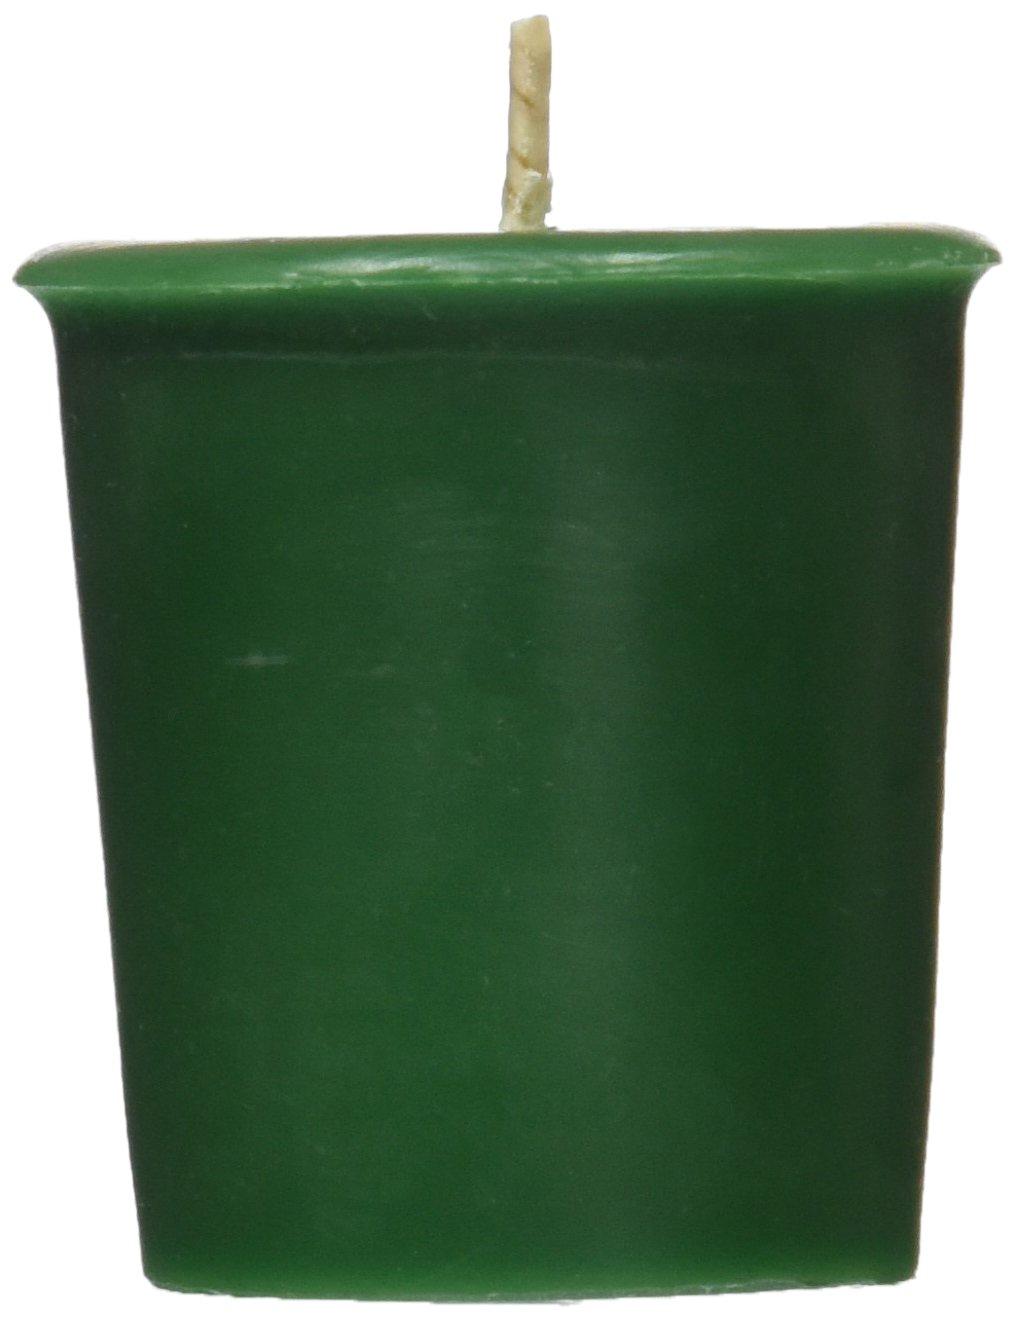 Northern Lights Candles Fragrance Palette 6Pc Votive Box, Evergreen Forest